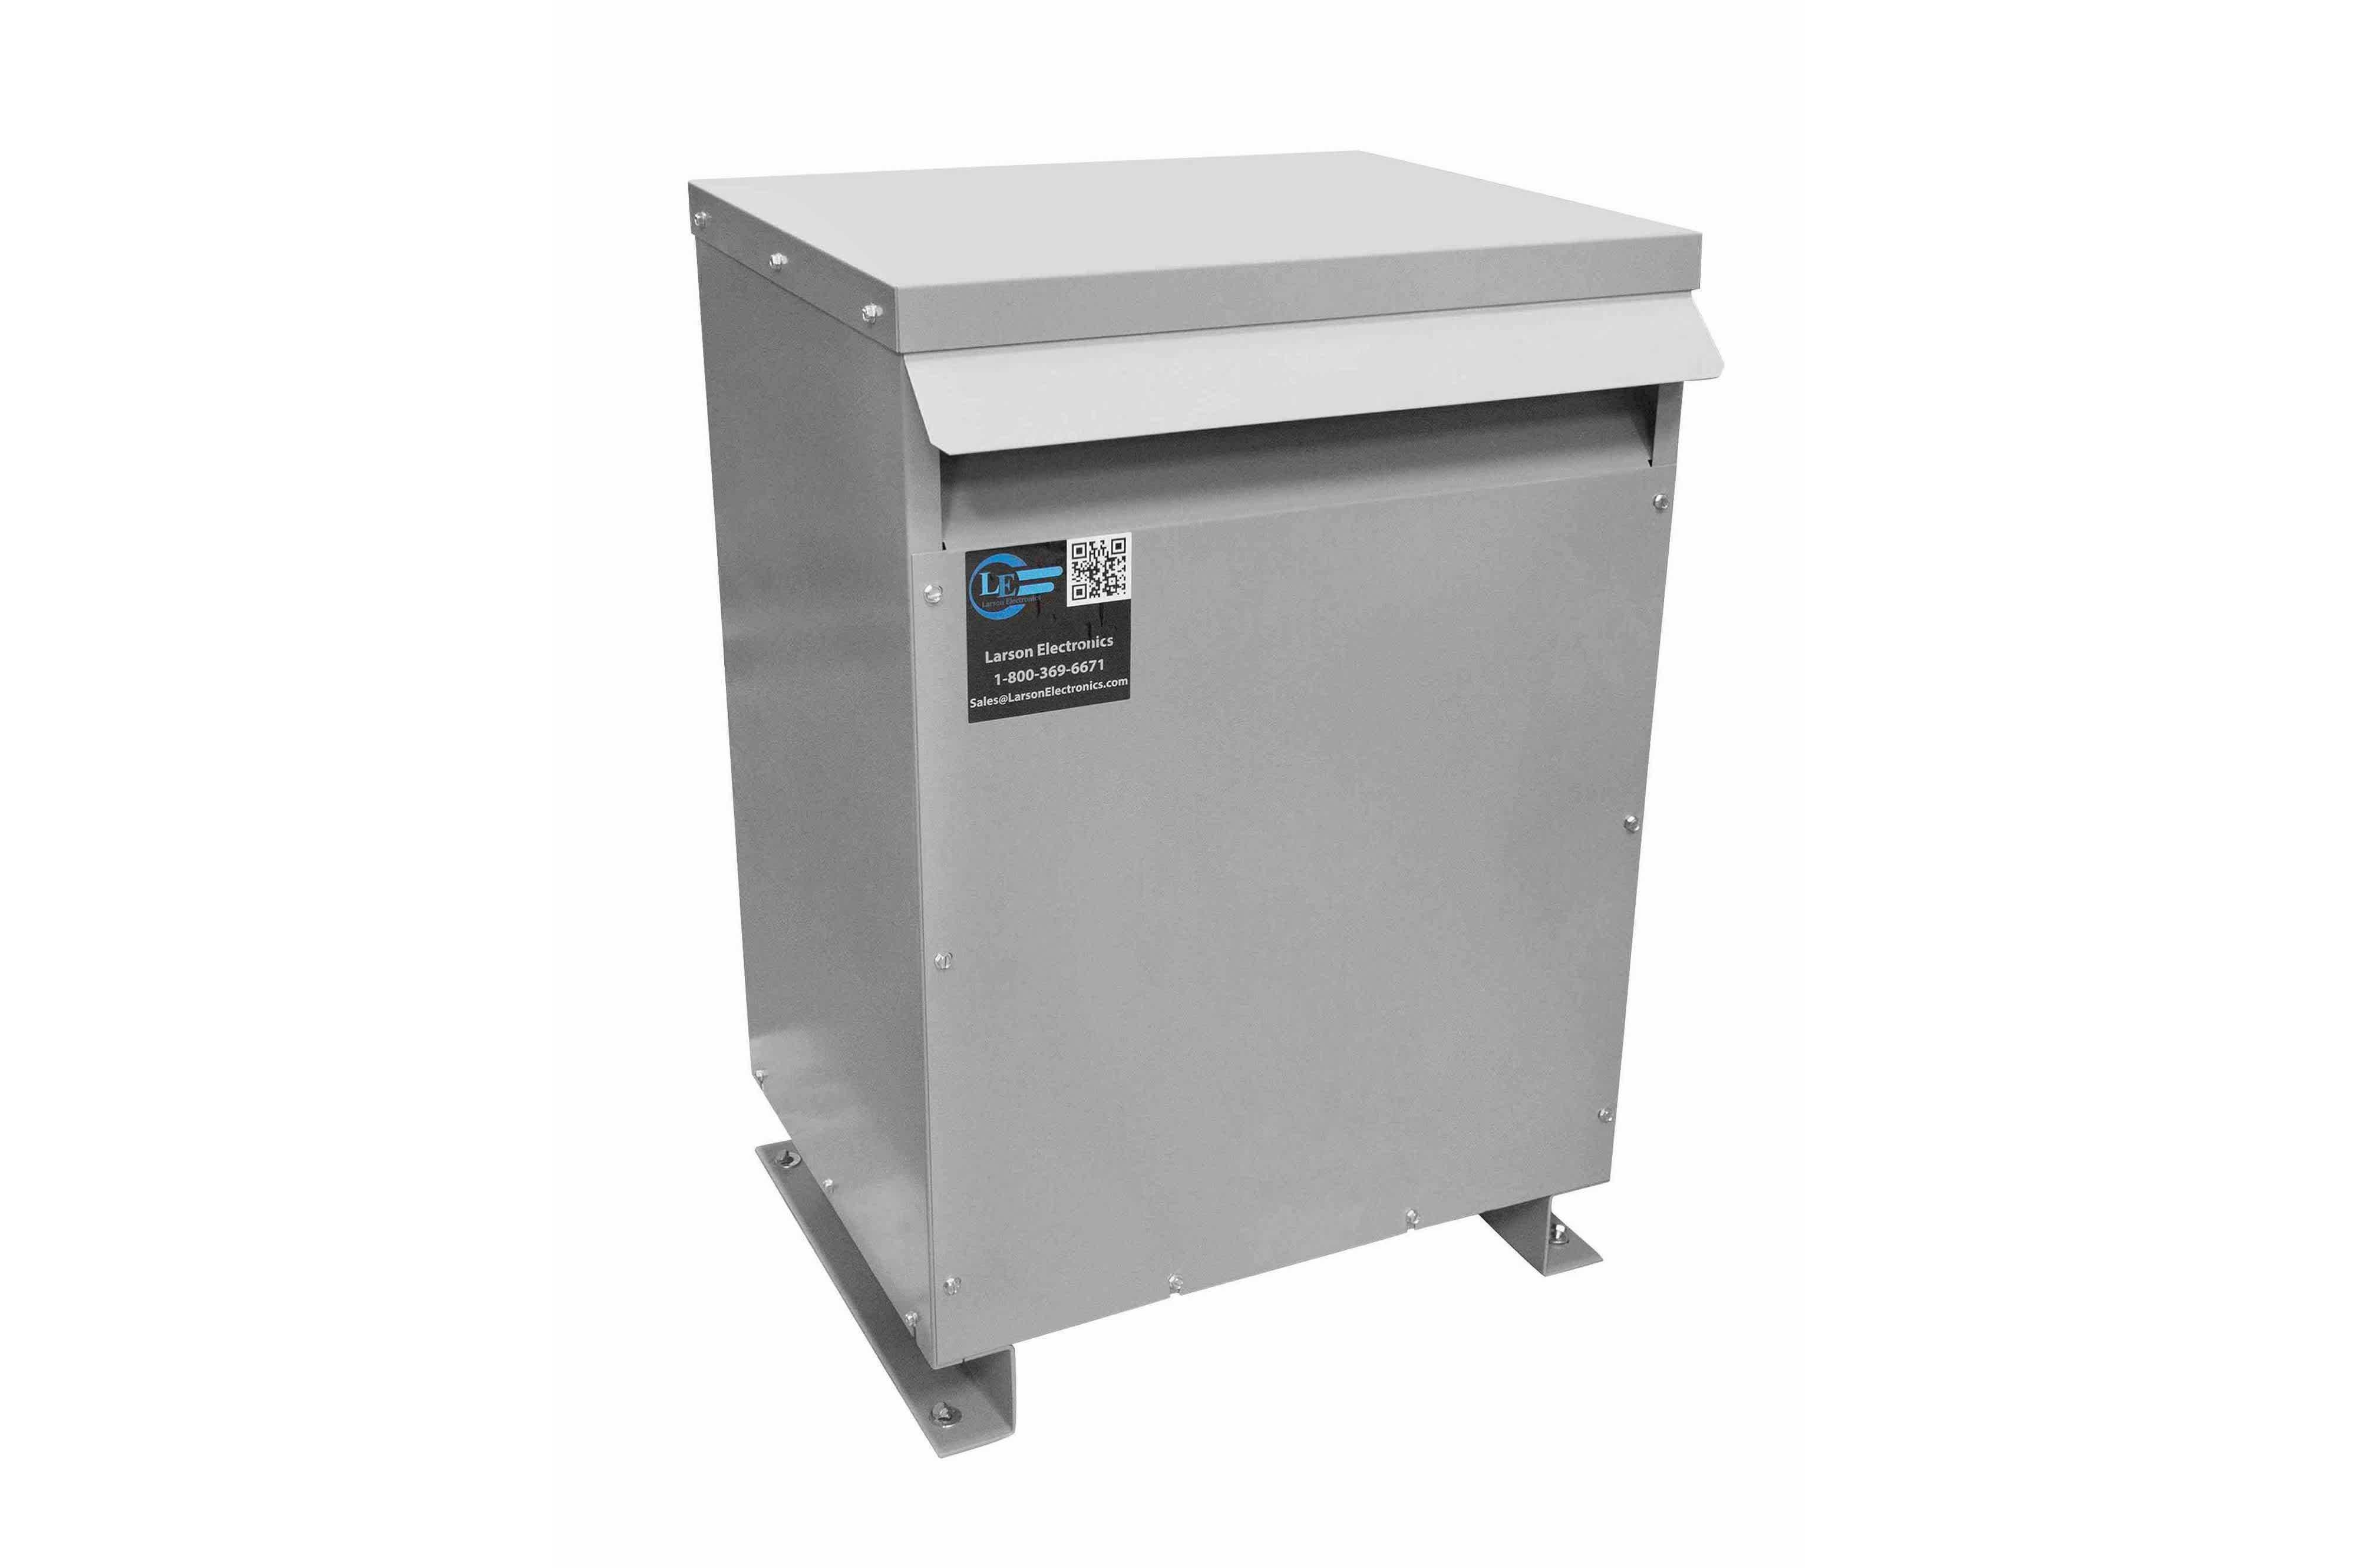 28 kVA 3PH Isolation Transformer, 480V Wye Primary, 380Y/220 Wye-N Secondary, N3R, Ventilated, 60 Hz